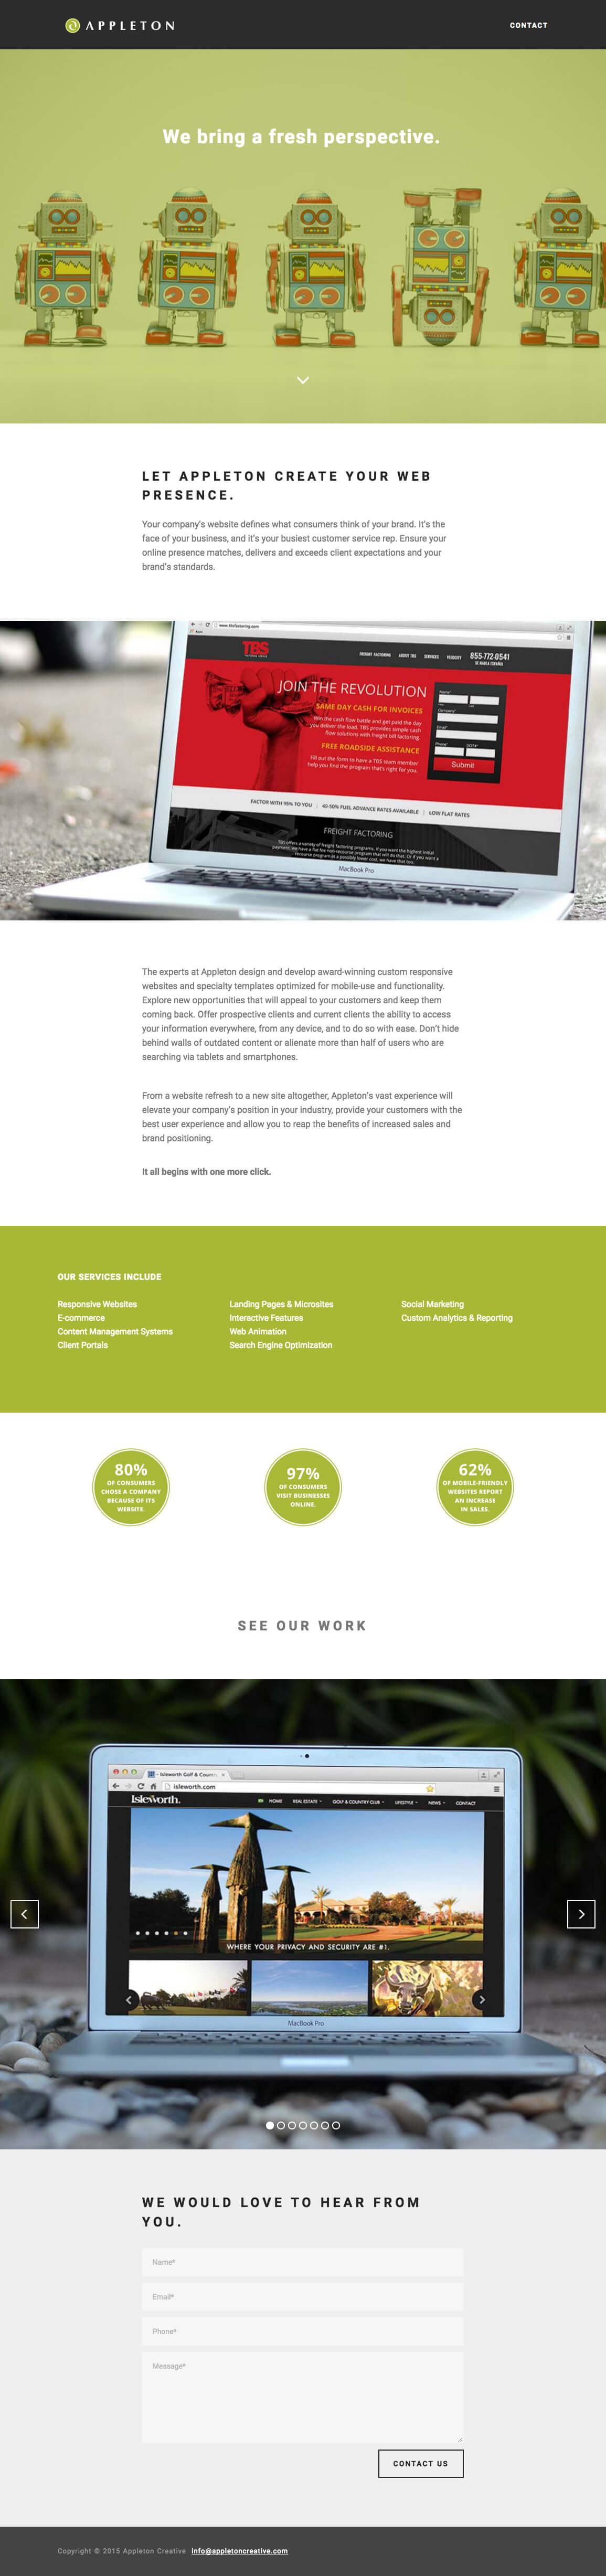 web design landing page design example